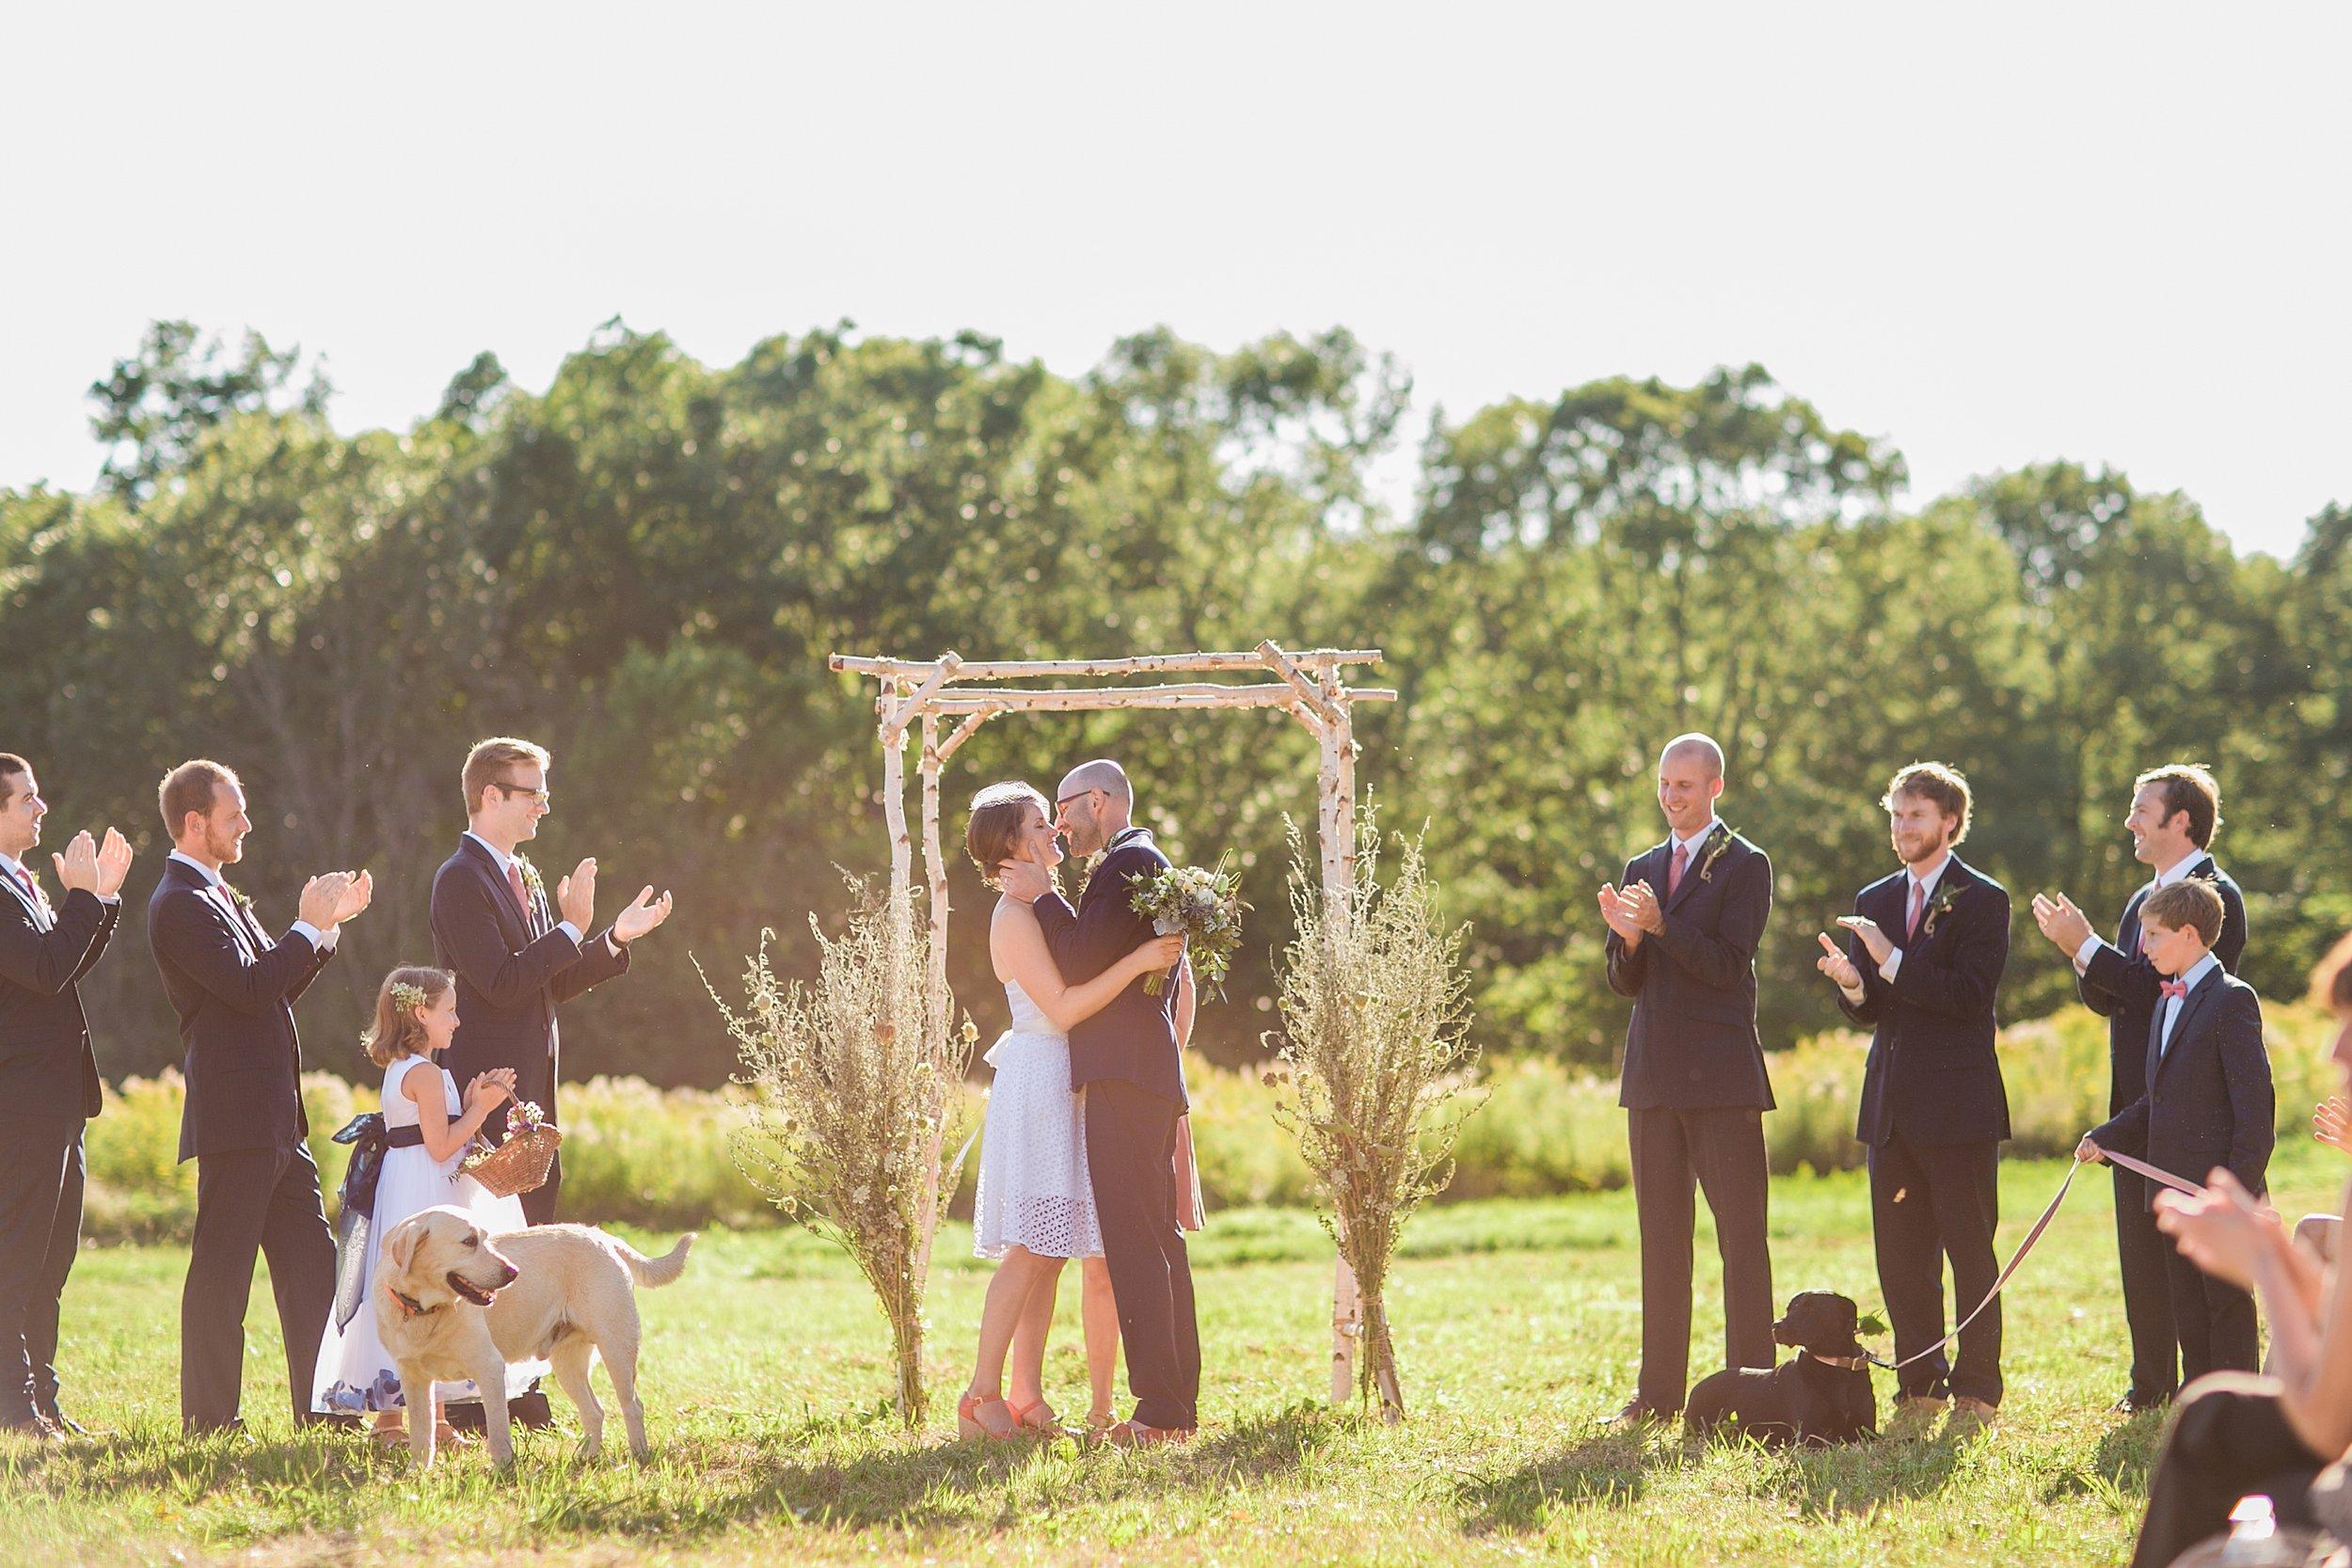 048 los angeles wedding photographer.jpg